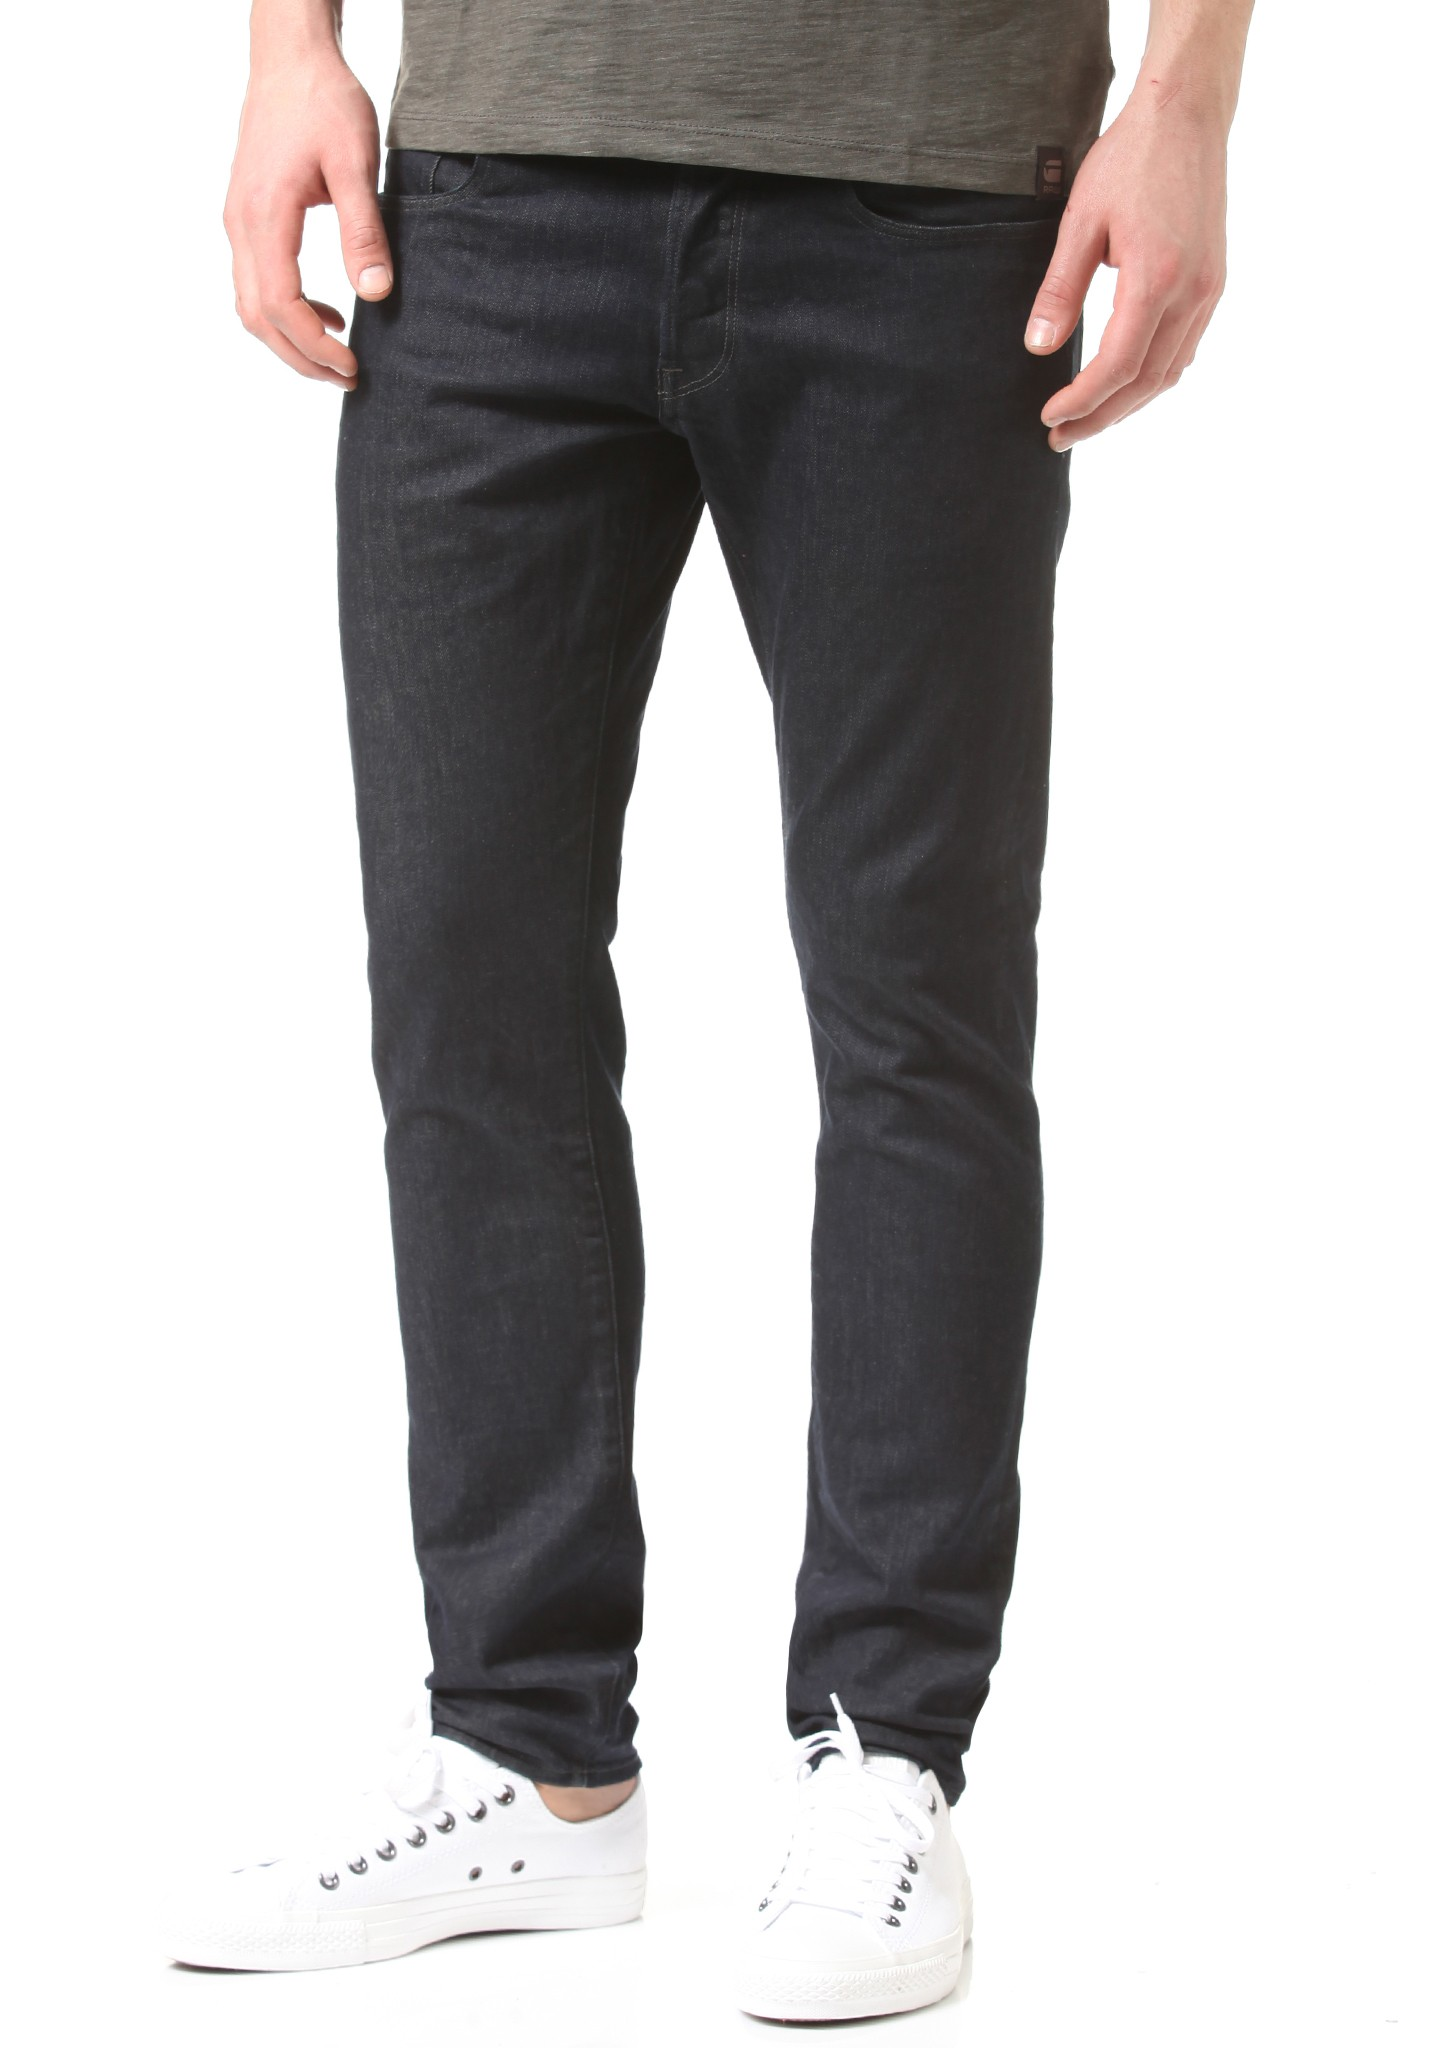 neu g star 3301 slim avio stretch herren jeans hose ebay. Black Bedroom Furniture Sets. Home Design Ideas